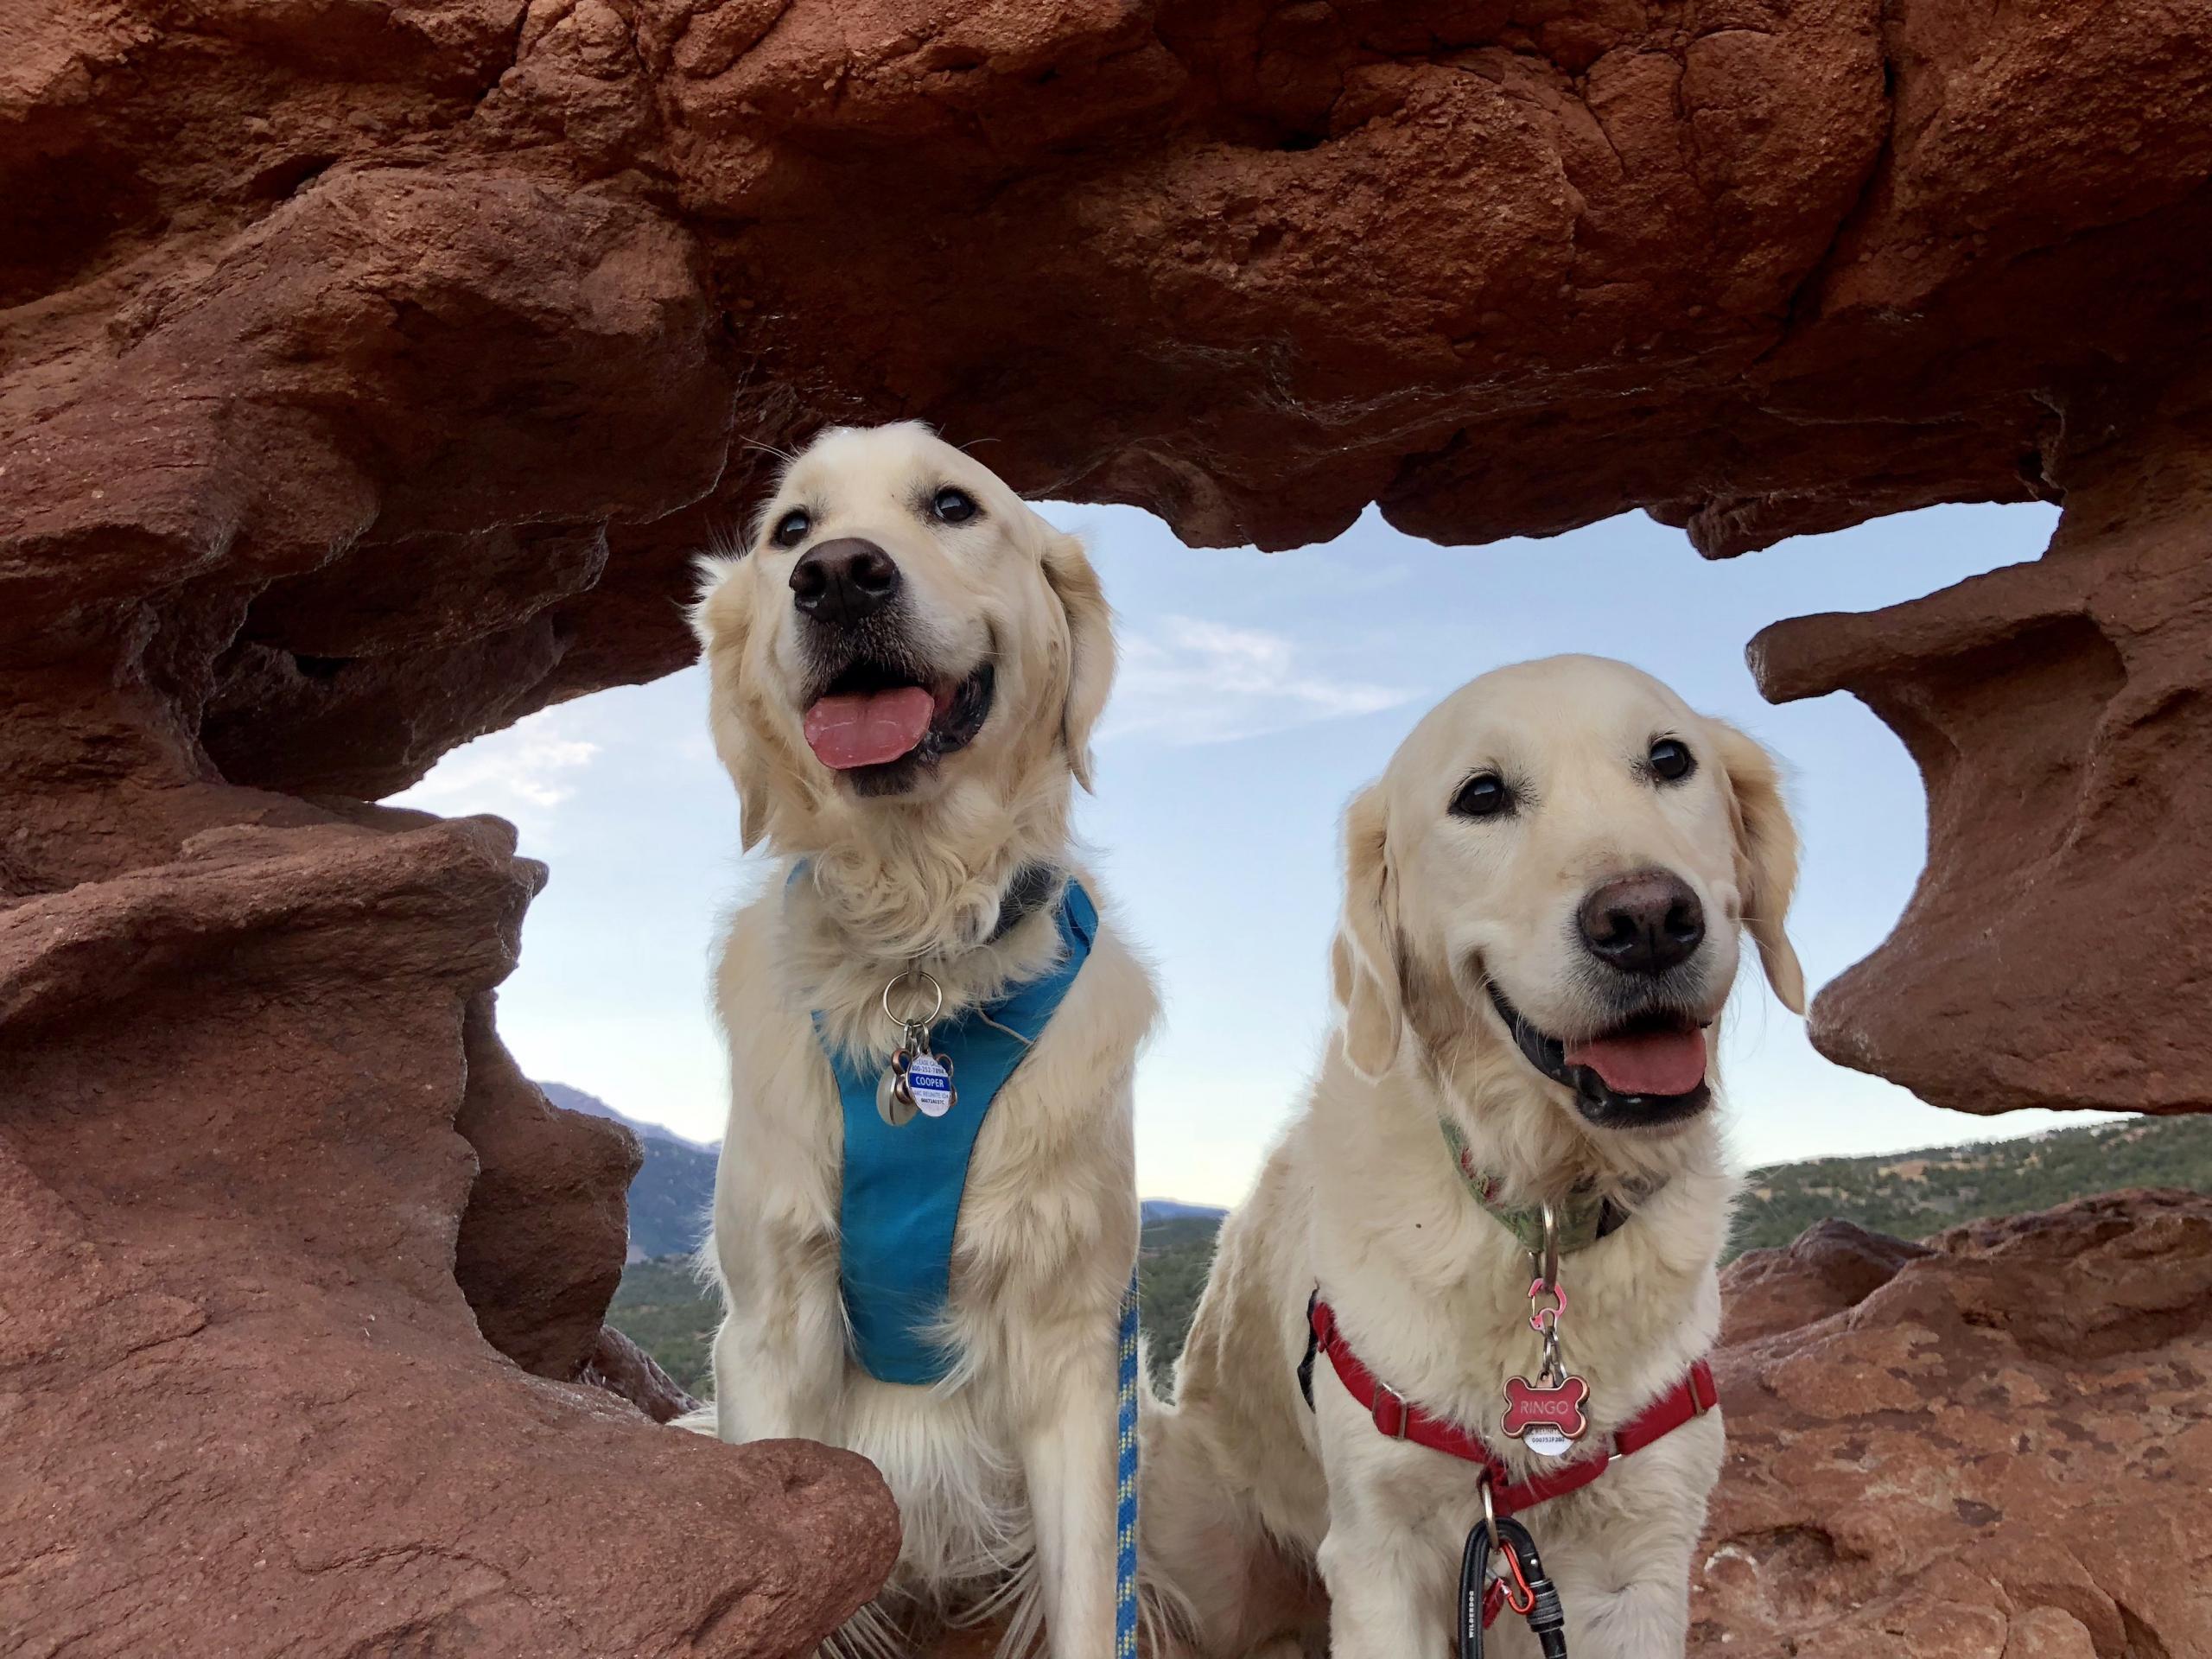 English Cream Golden Retriever puppies updates from Happy Families Wisteria Goldens Family Cooper (Harmony/Ego) , Ringo (Zoey/Thor) Outdoor Advernturers